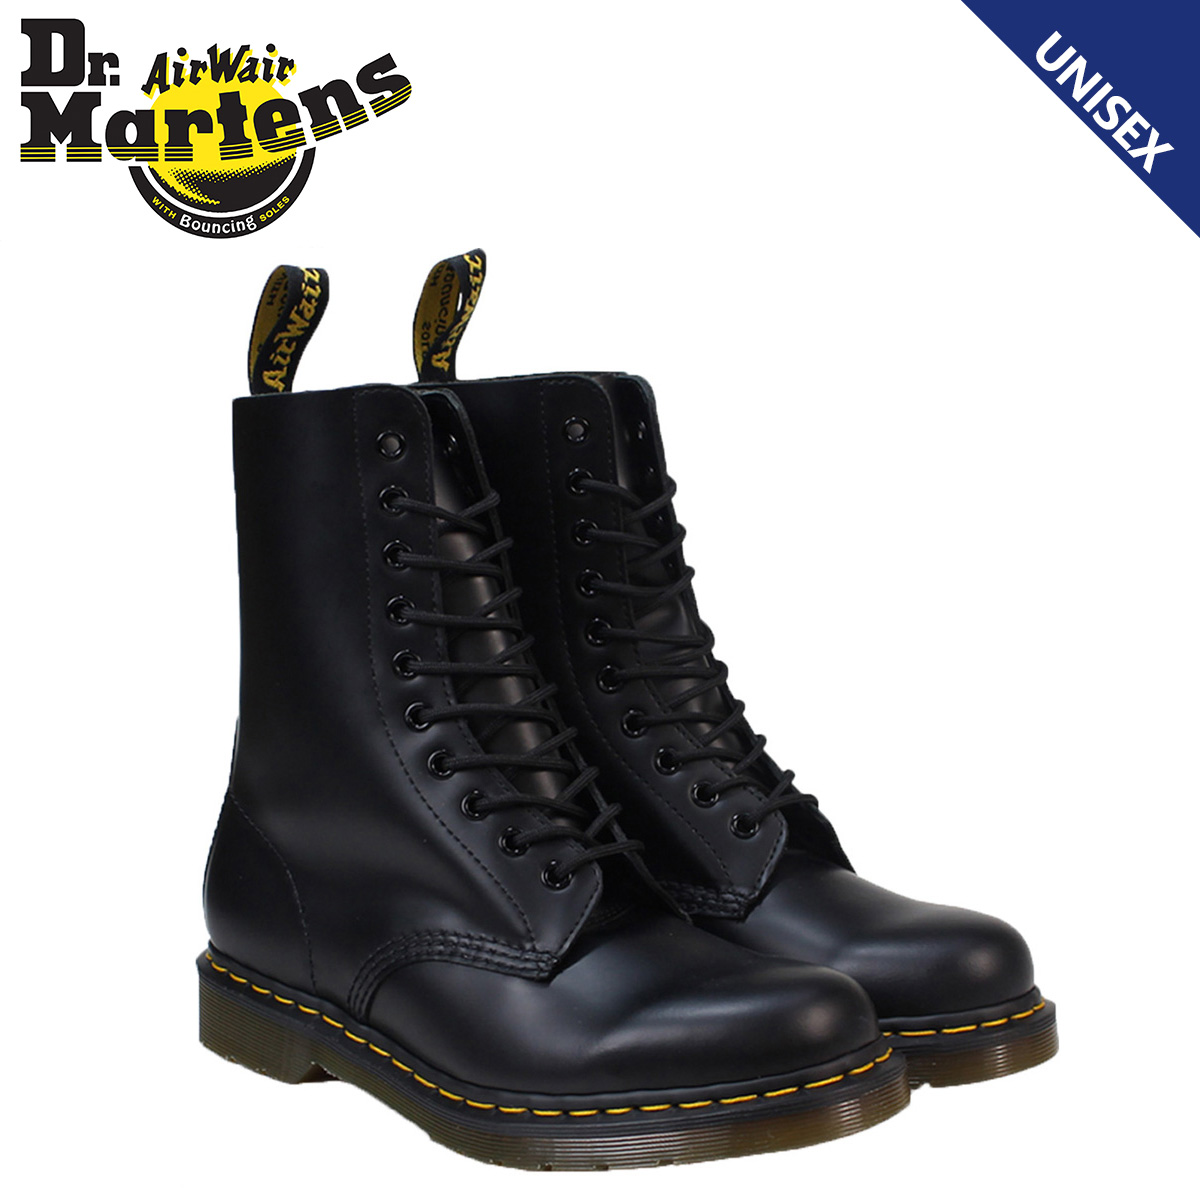 Dr. Martens Dr.Martens 10 hole boot R11857001 1490 leather men women